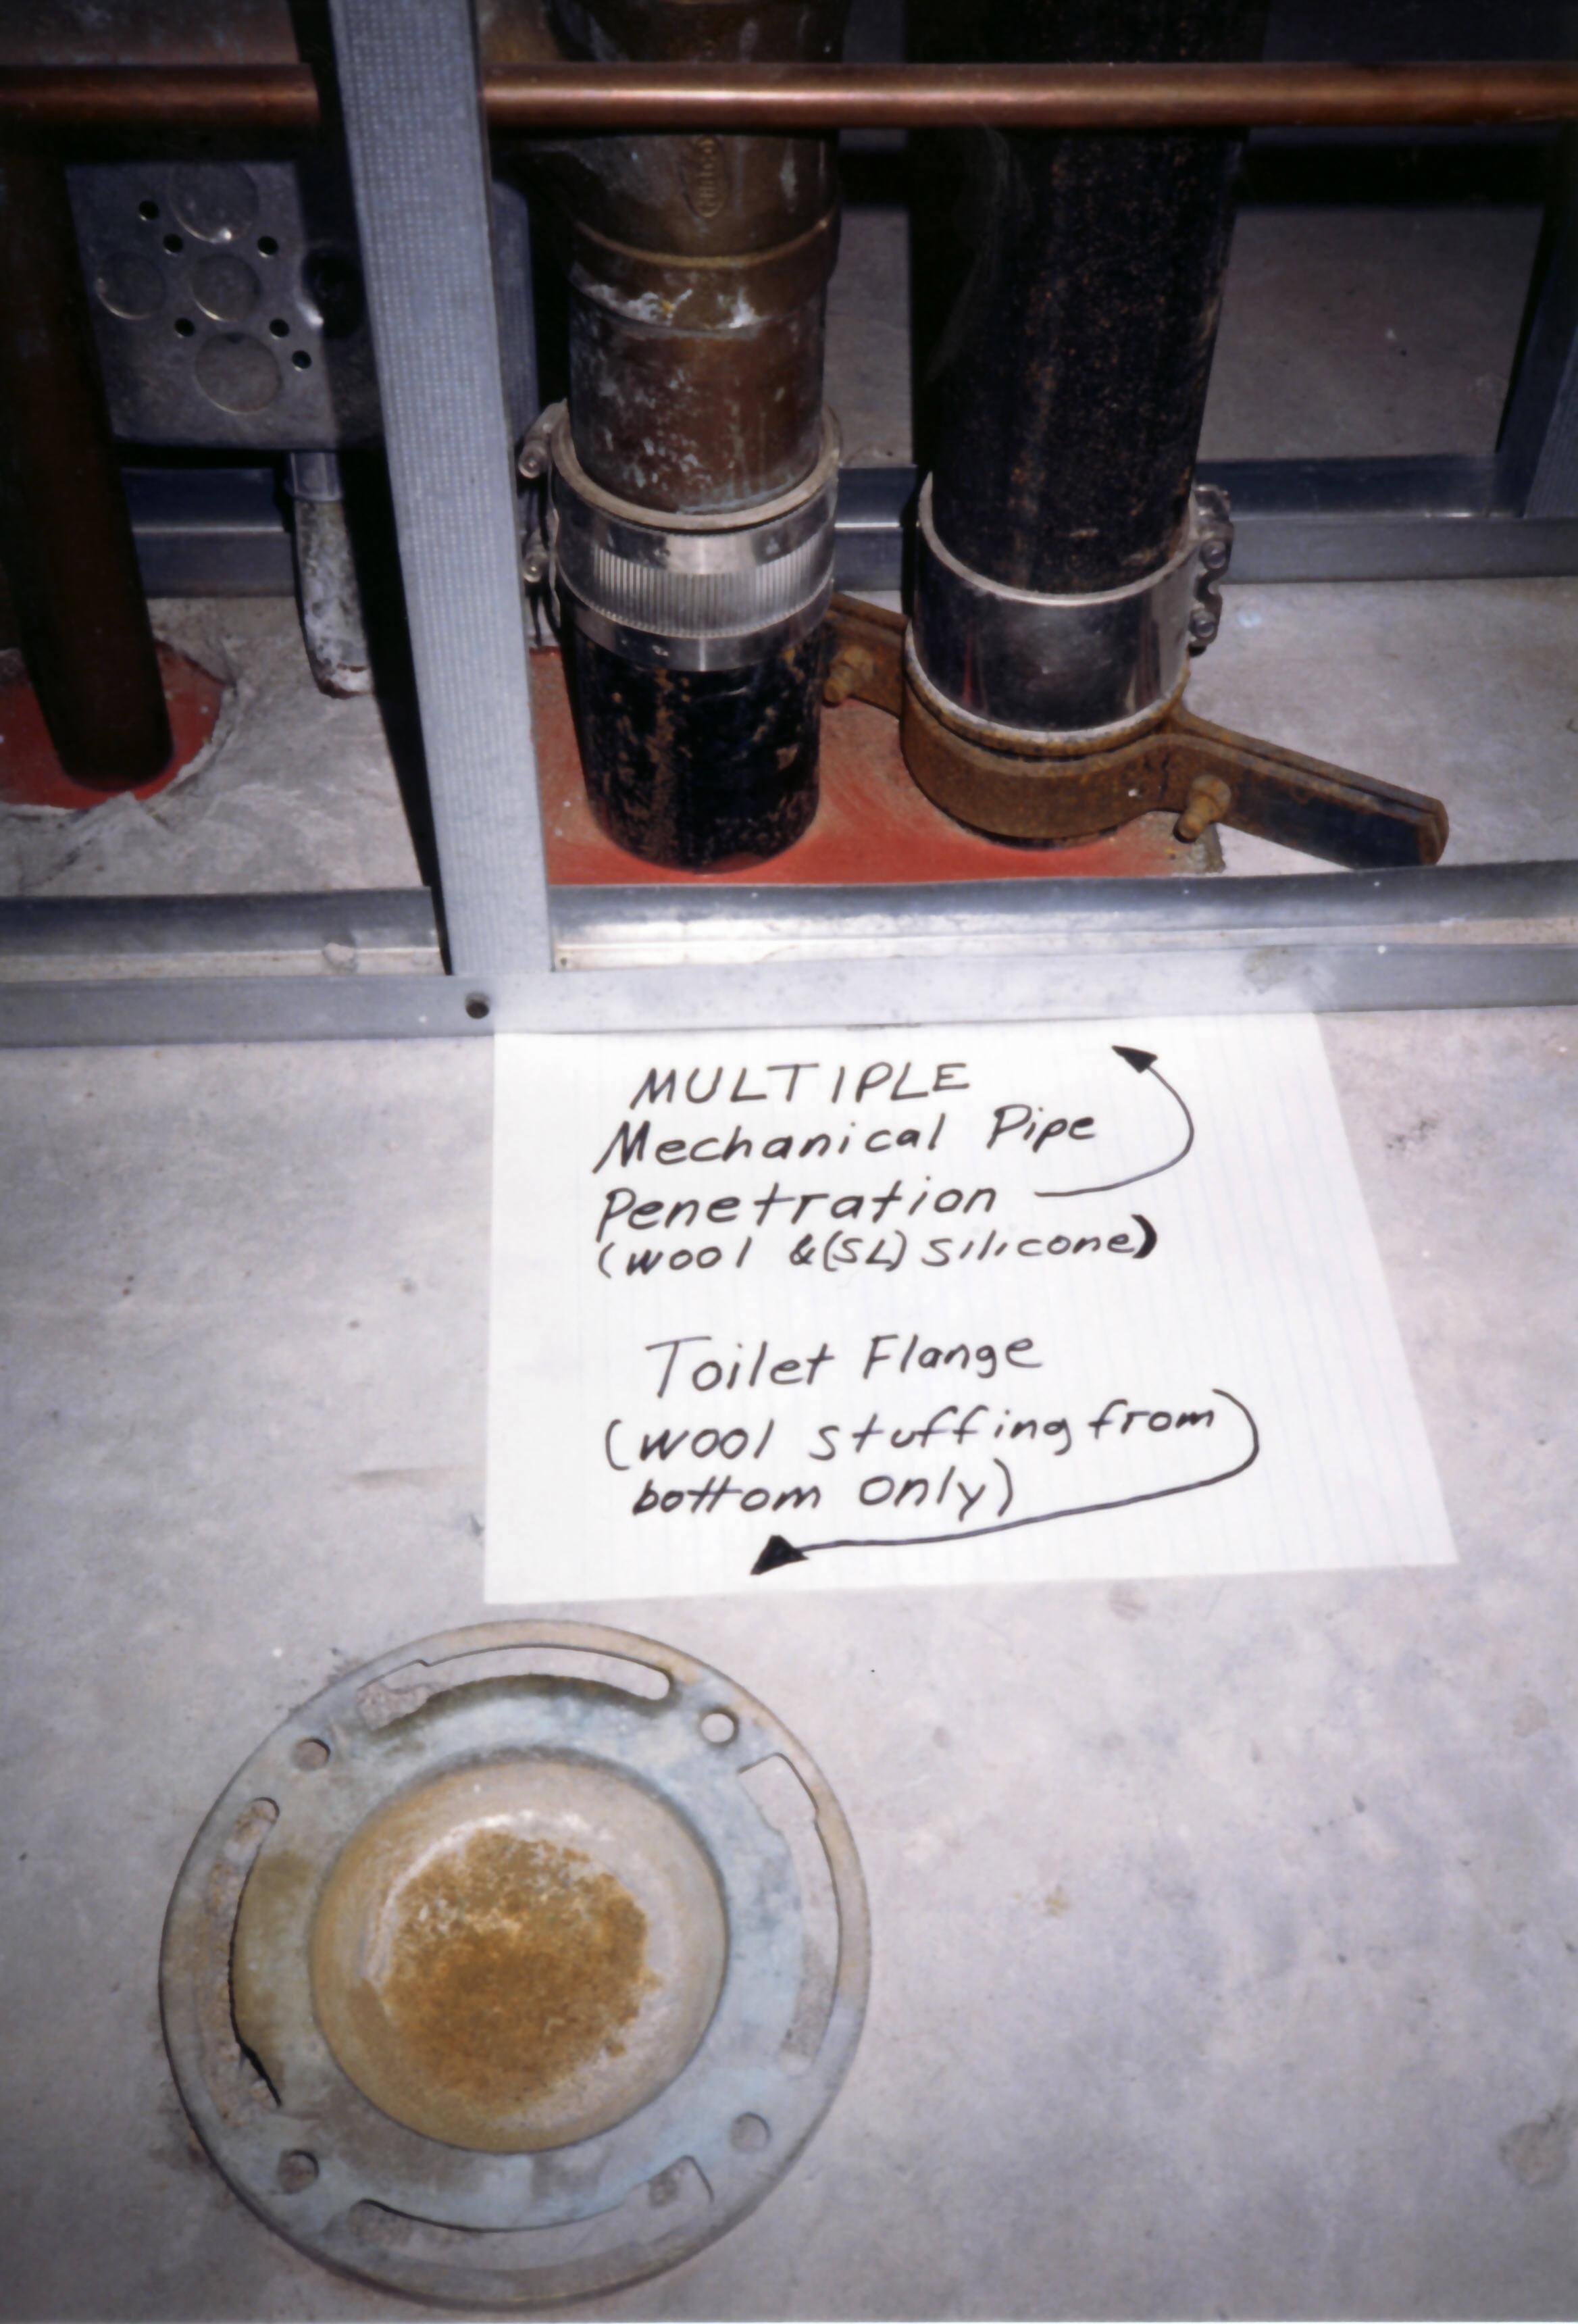 File:Toilet flange.jpg - Wikimedia Commons